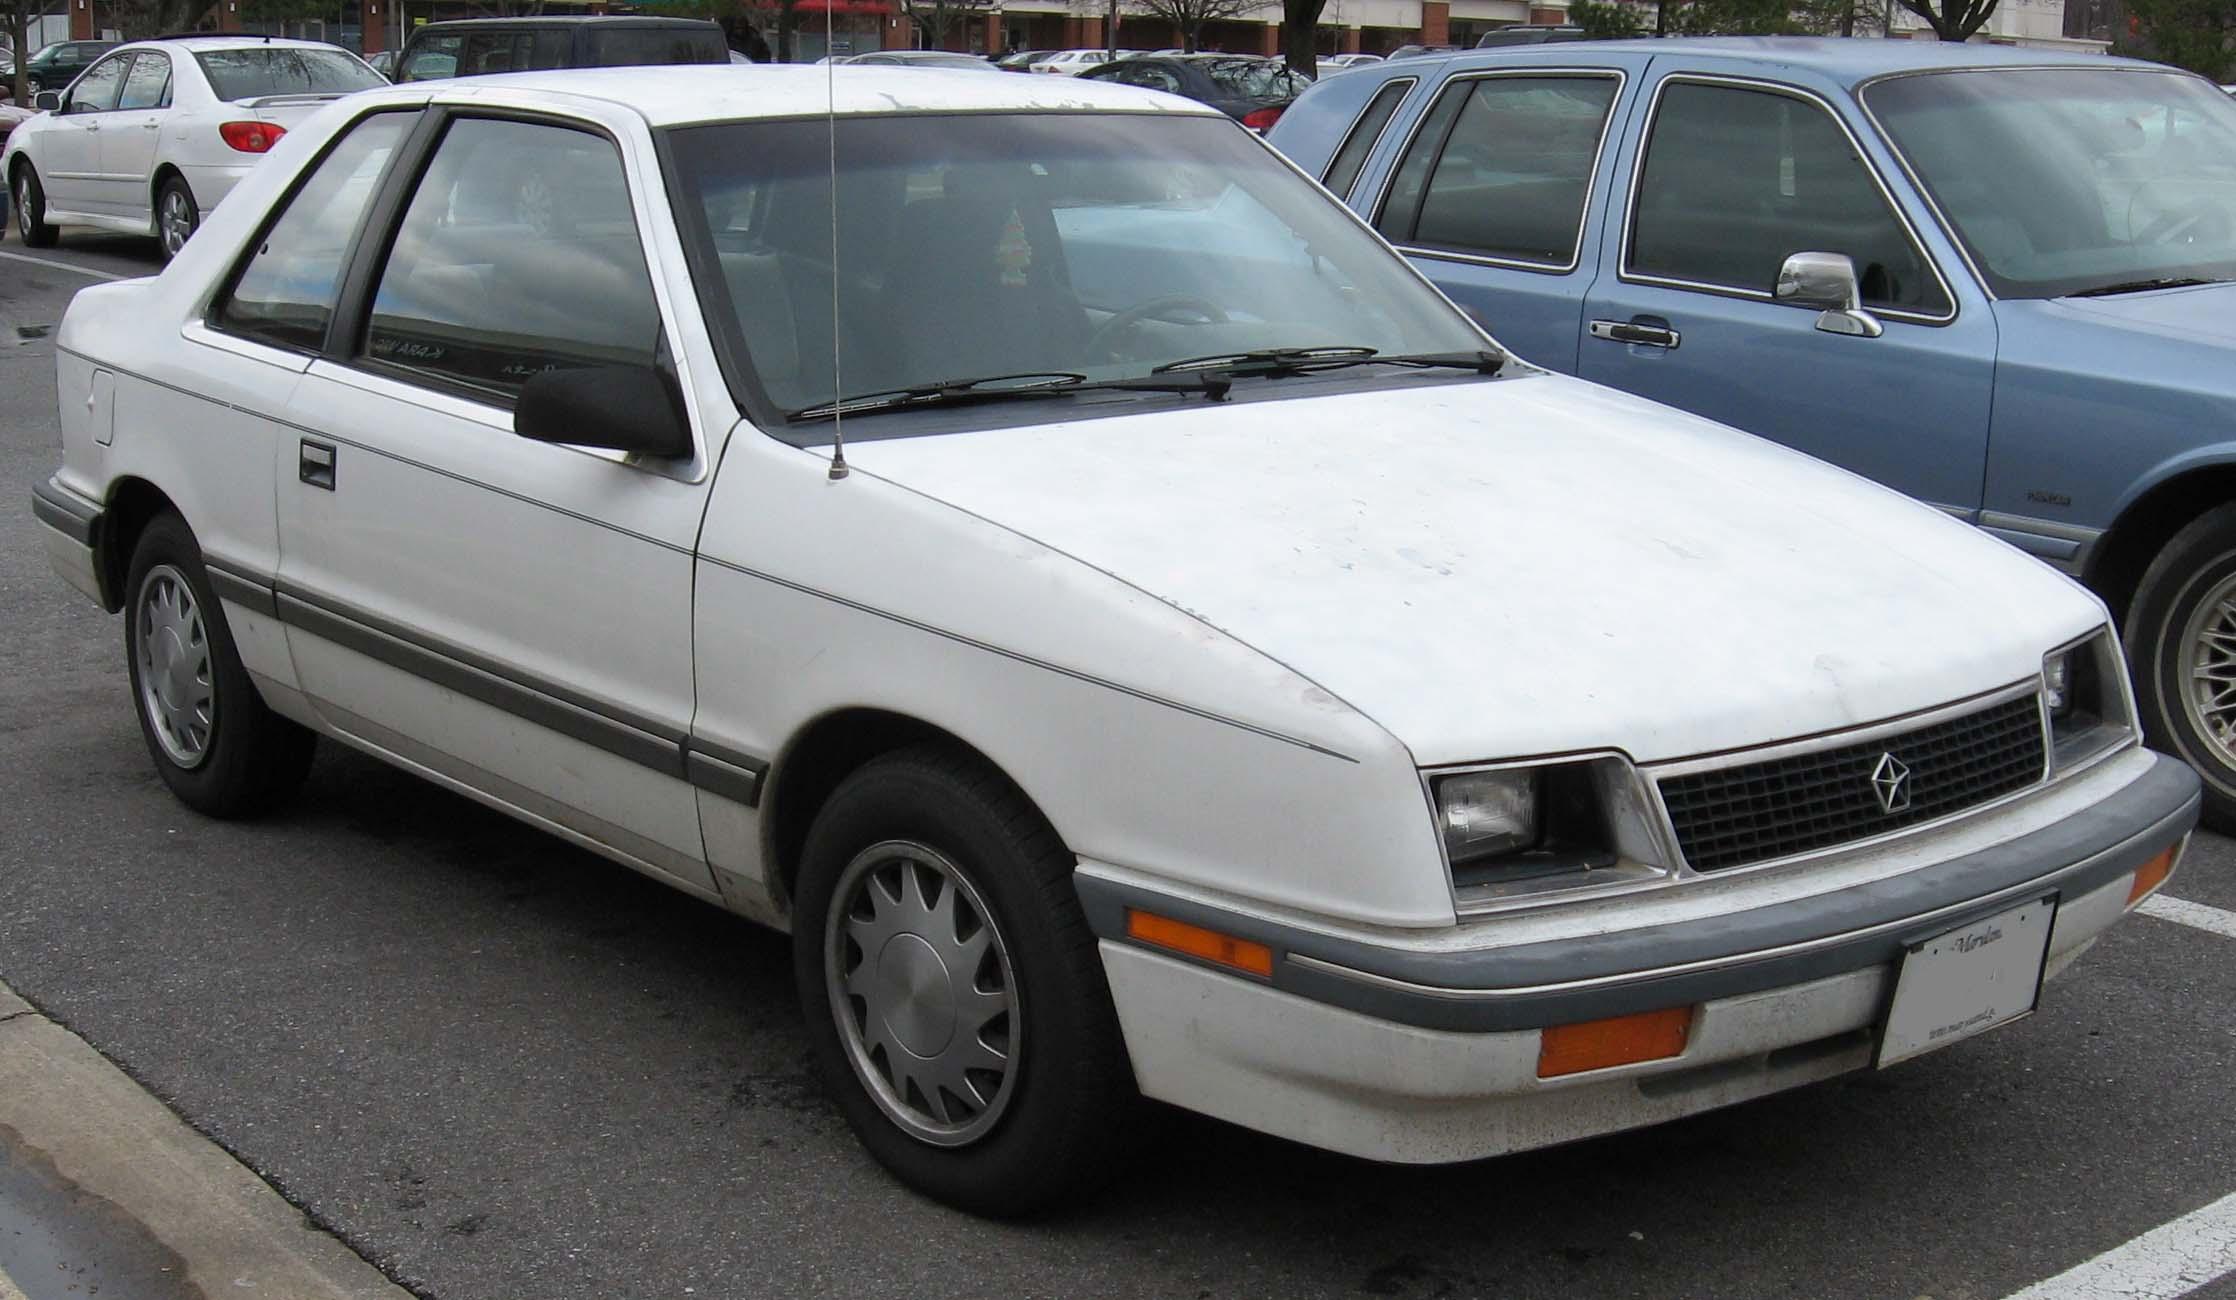 1990 Plymouth Sundance Information And Photos Zombiedrive Dodge Ram Fuse Box 9